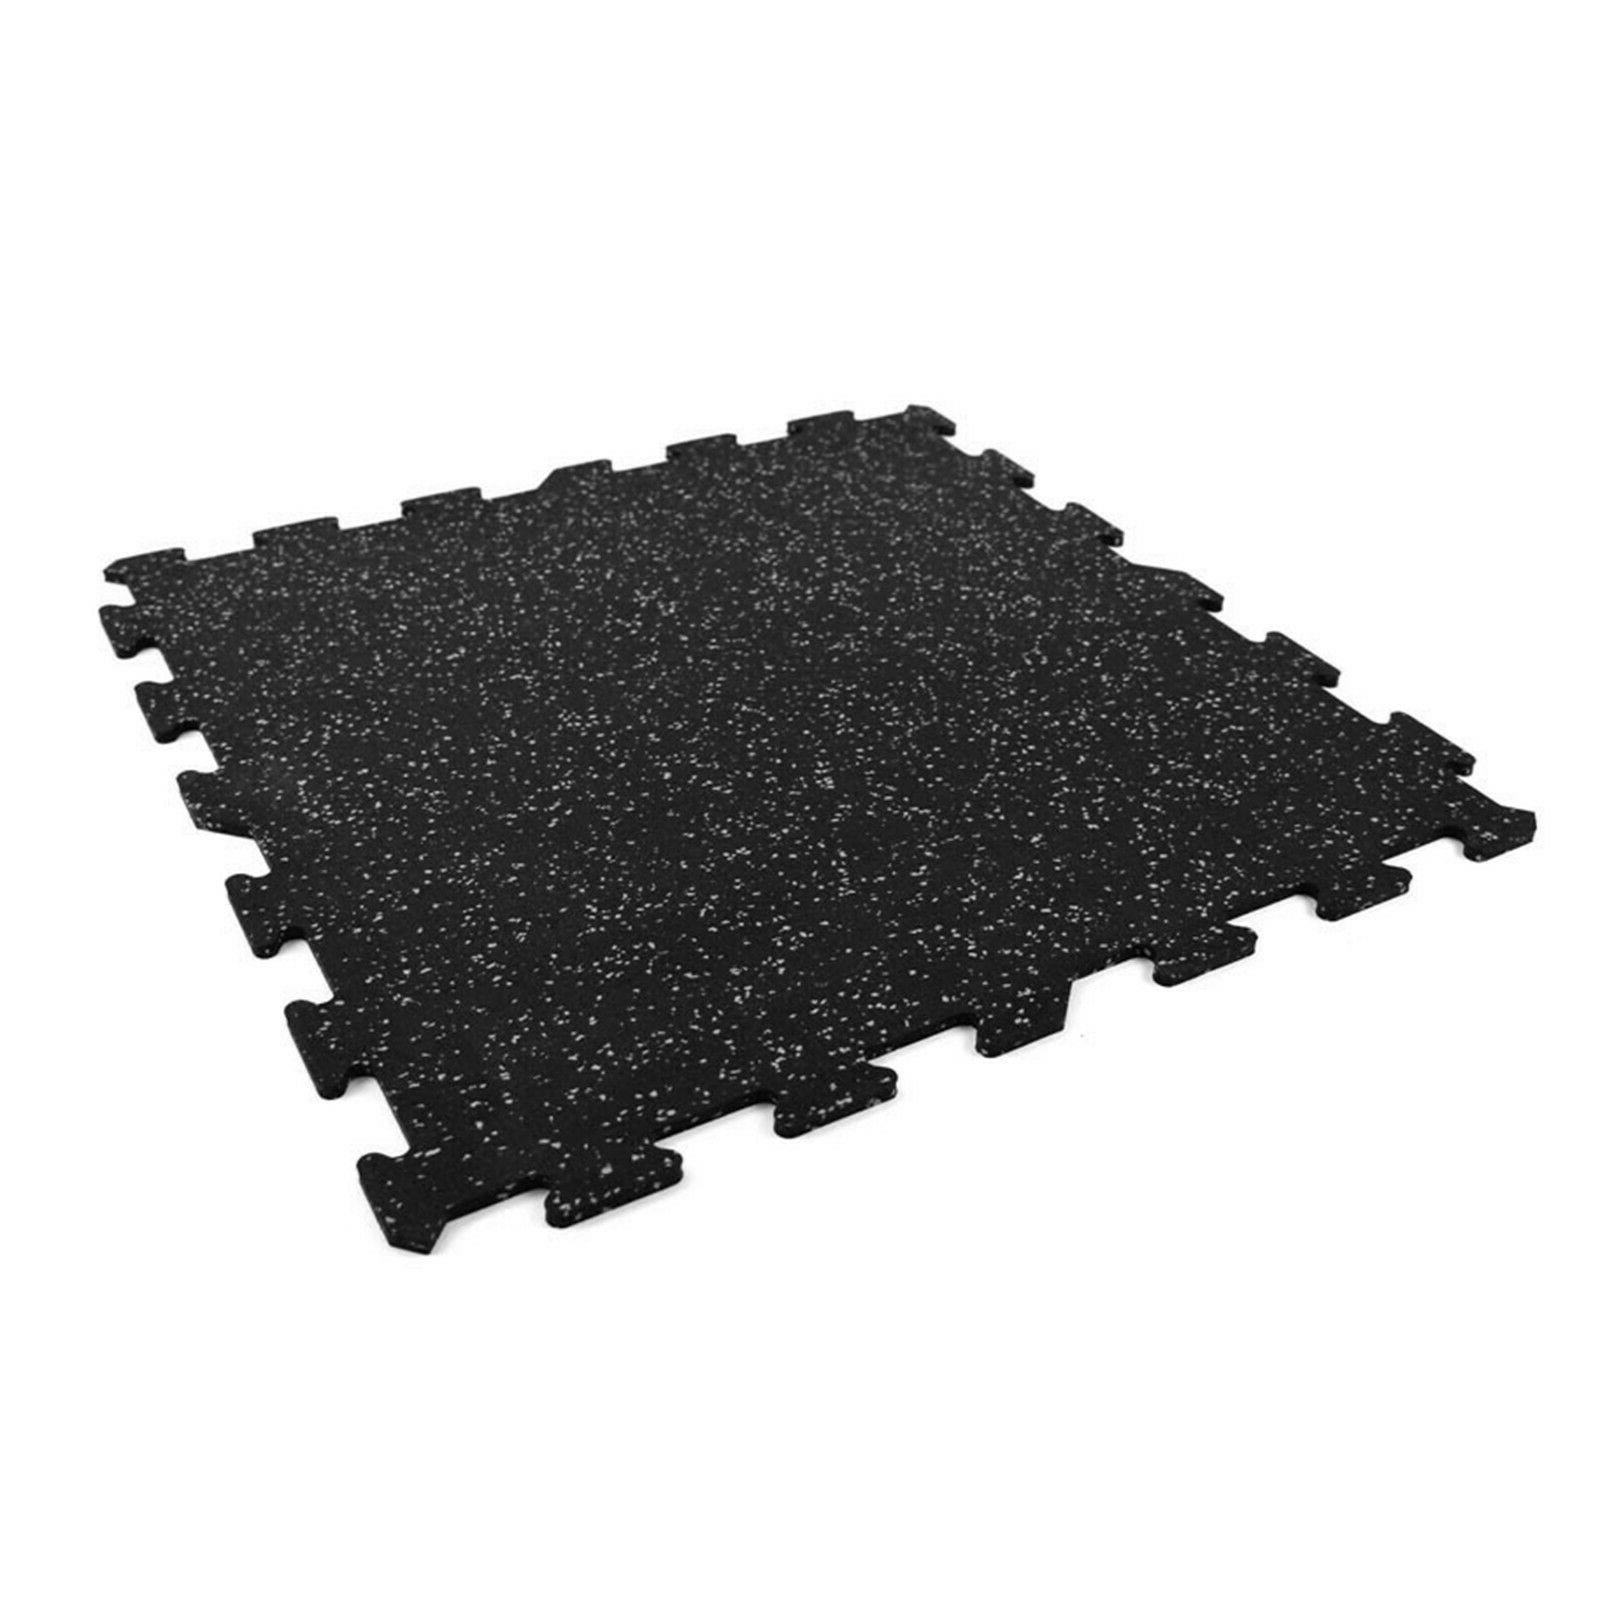 FlooringInc 8mm Strong Rubber Tiles | Gym Flooring For Exerc